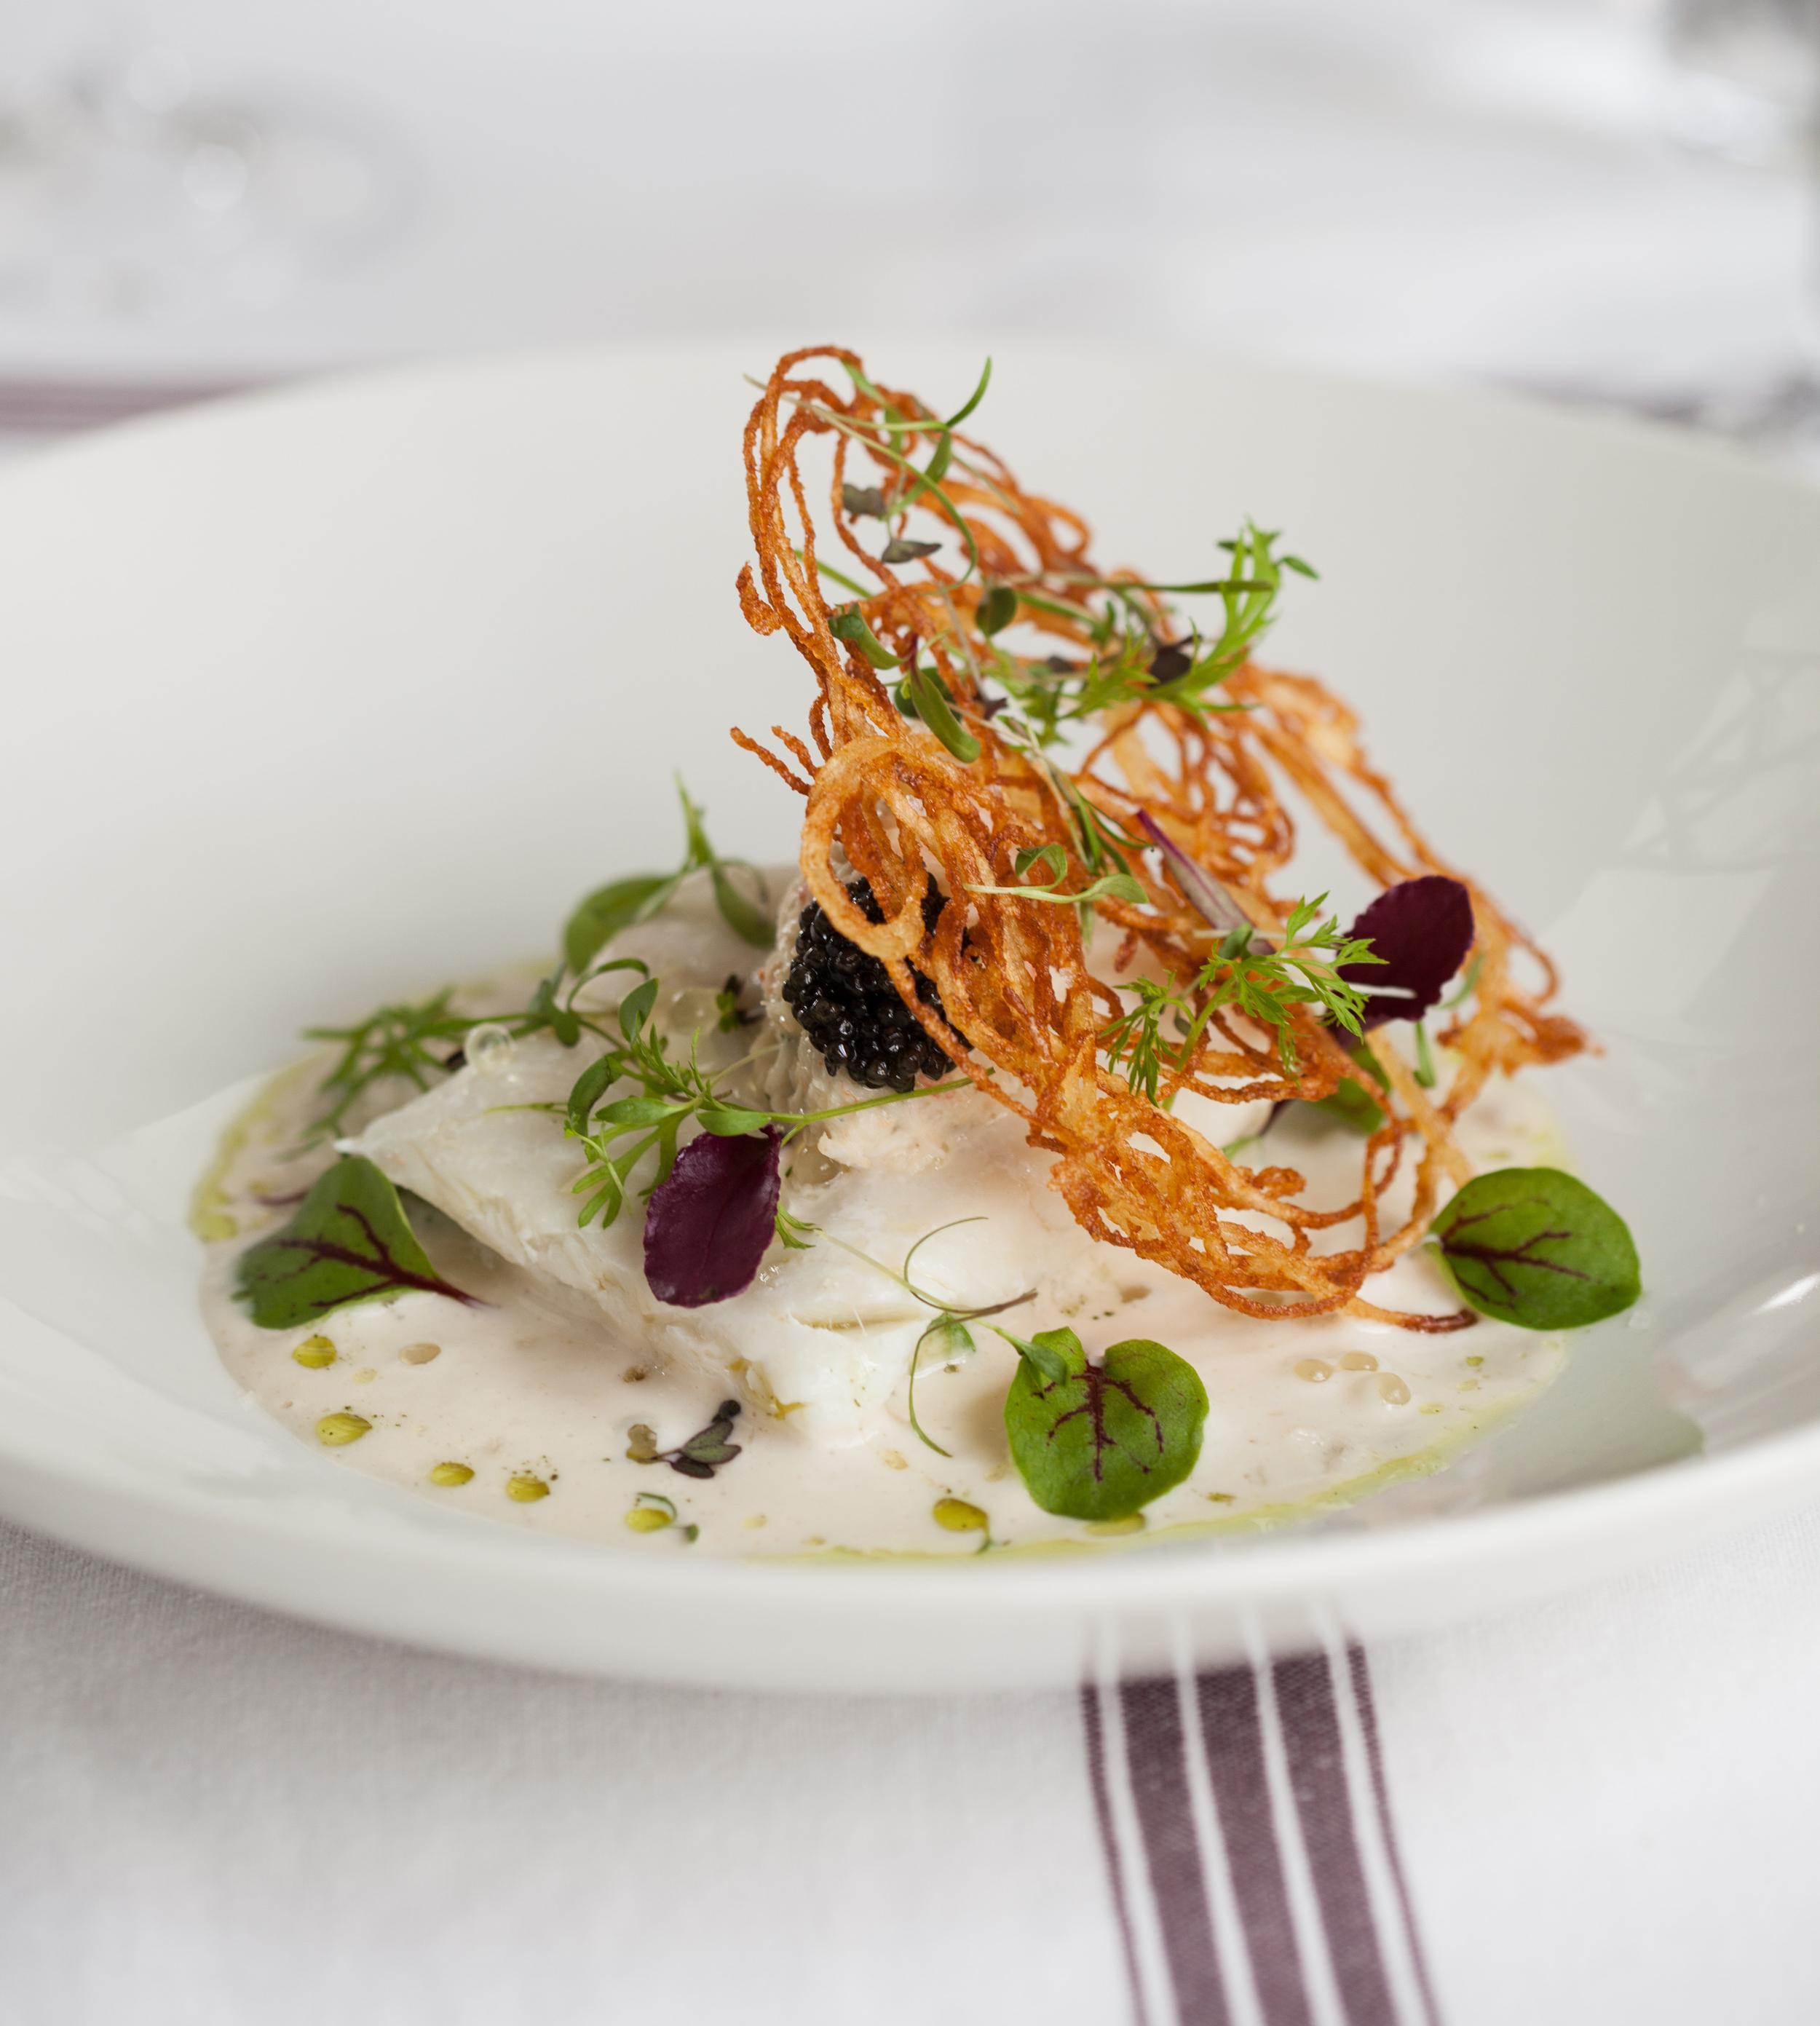 The risotto at  Grande Provence Restaurant